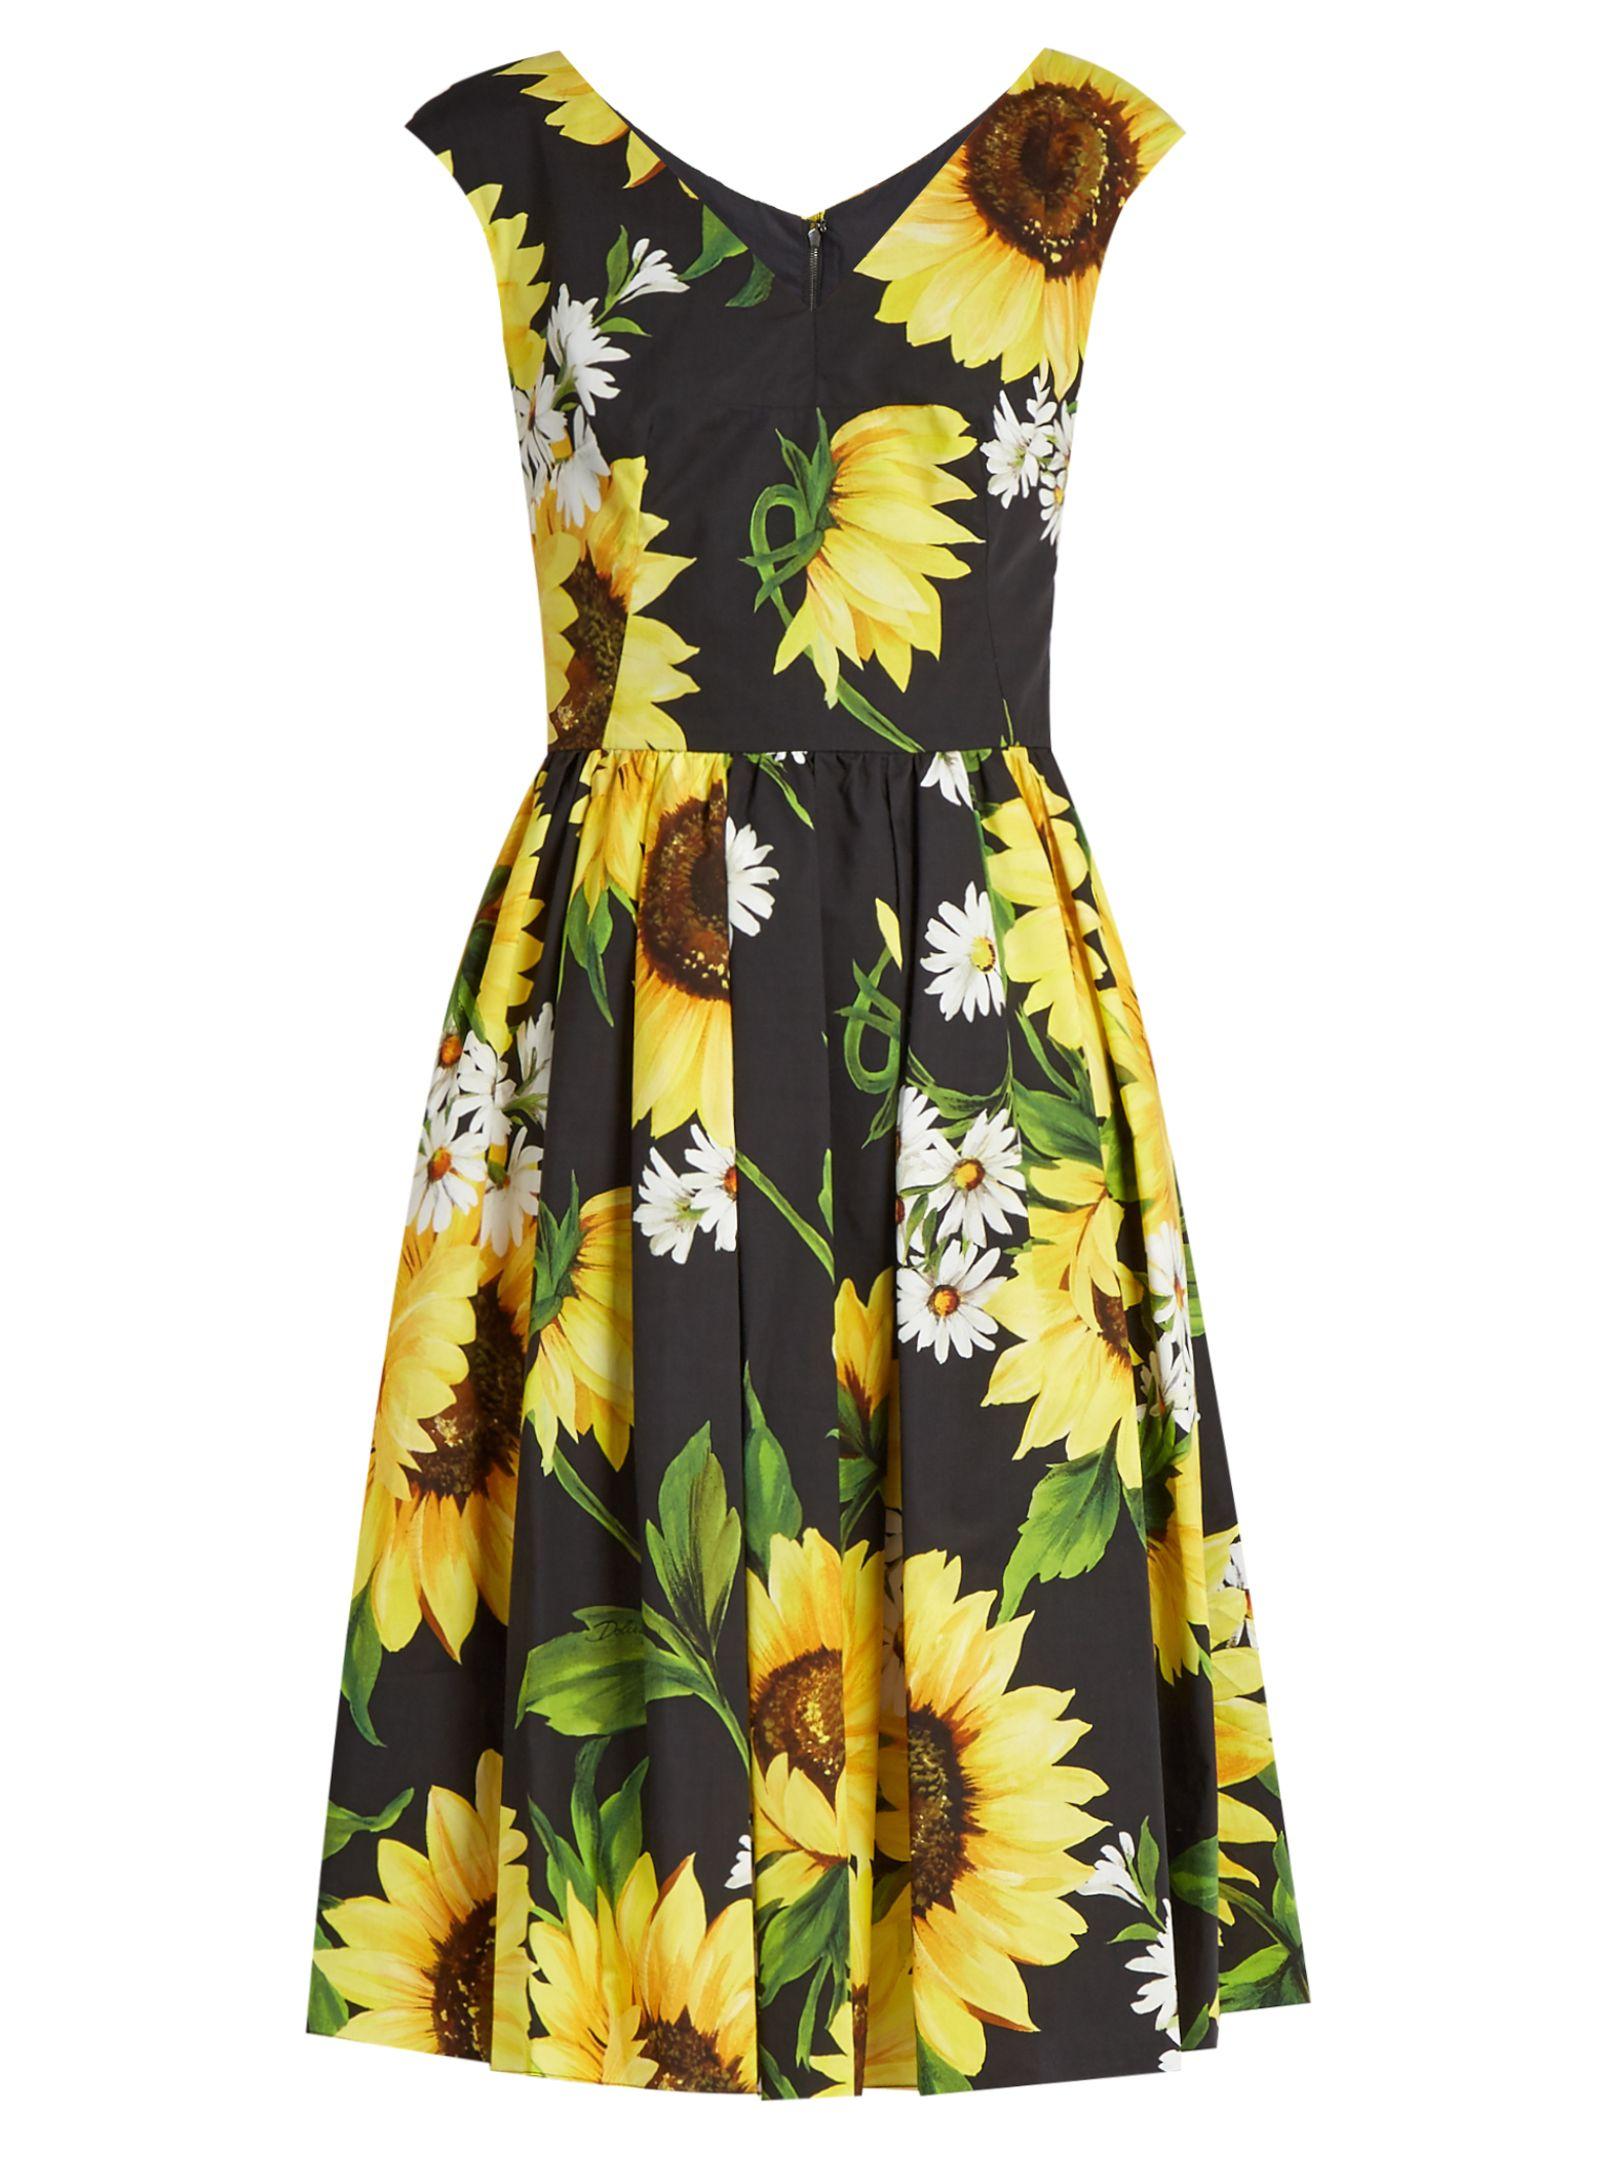 60d61b444405 Click here to buy Dolce & Gabbana Sunflower-print cotton-poplin dress at  MATCHESFASHION.COM